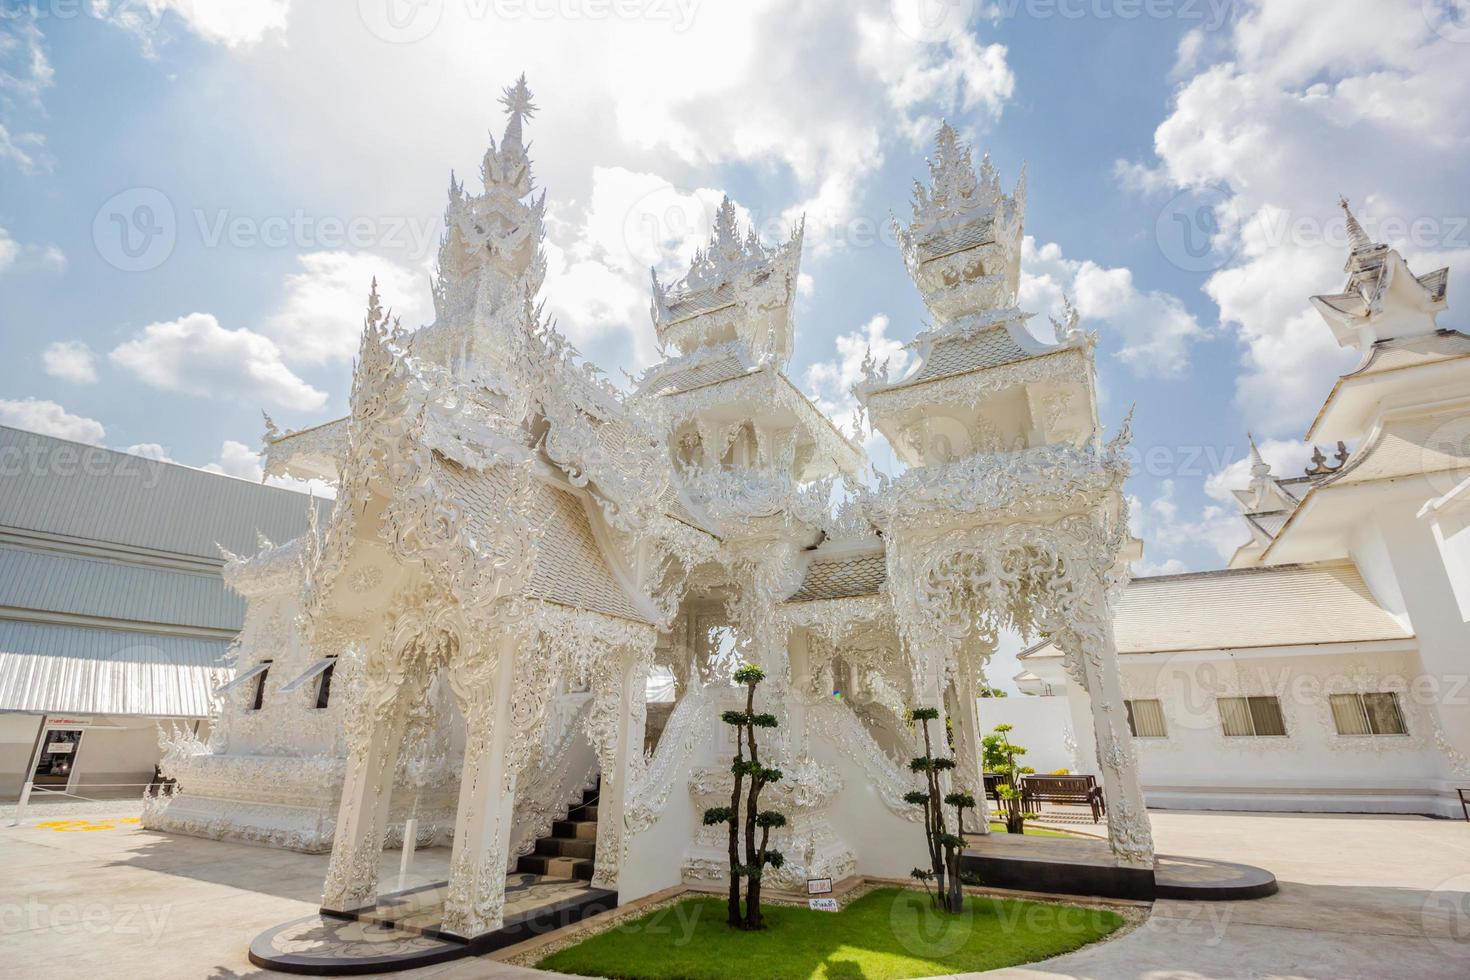 de tempel van Thailand - wat rong khun van chiangrai Thailand foto